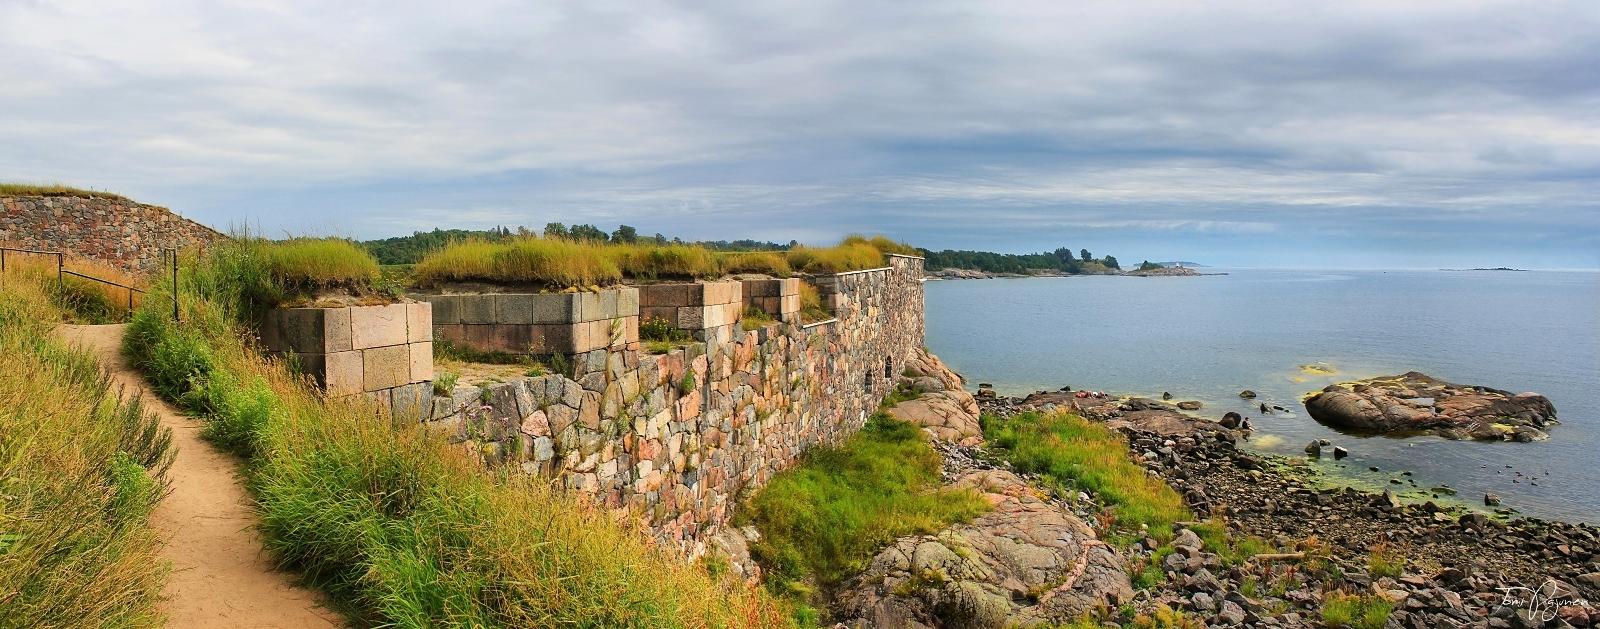 Walls of Suomenlinna Sea Fortress by Pajunen